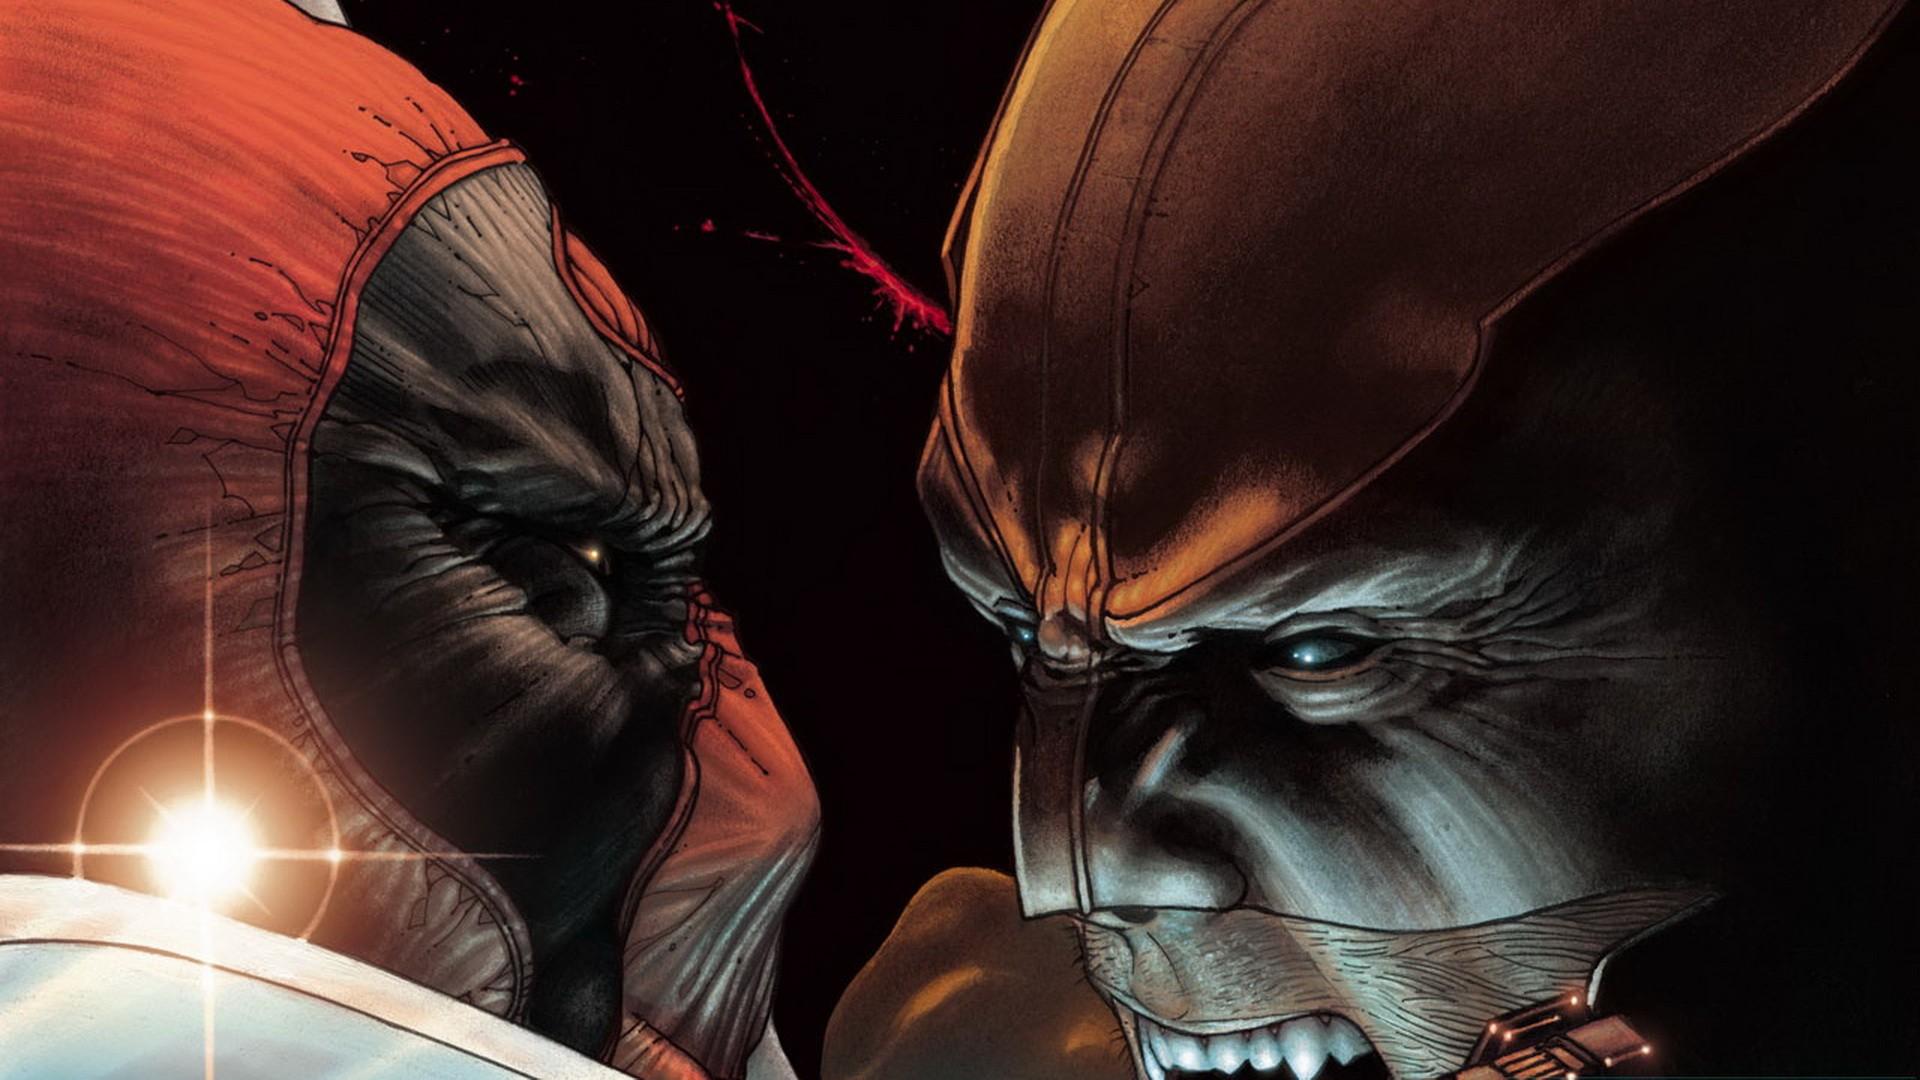 Wolverine Vs Deadpool HD Wallpaper Background Image 1920x1080 1920x1080